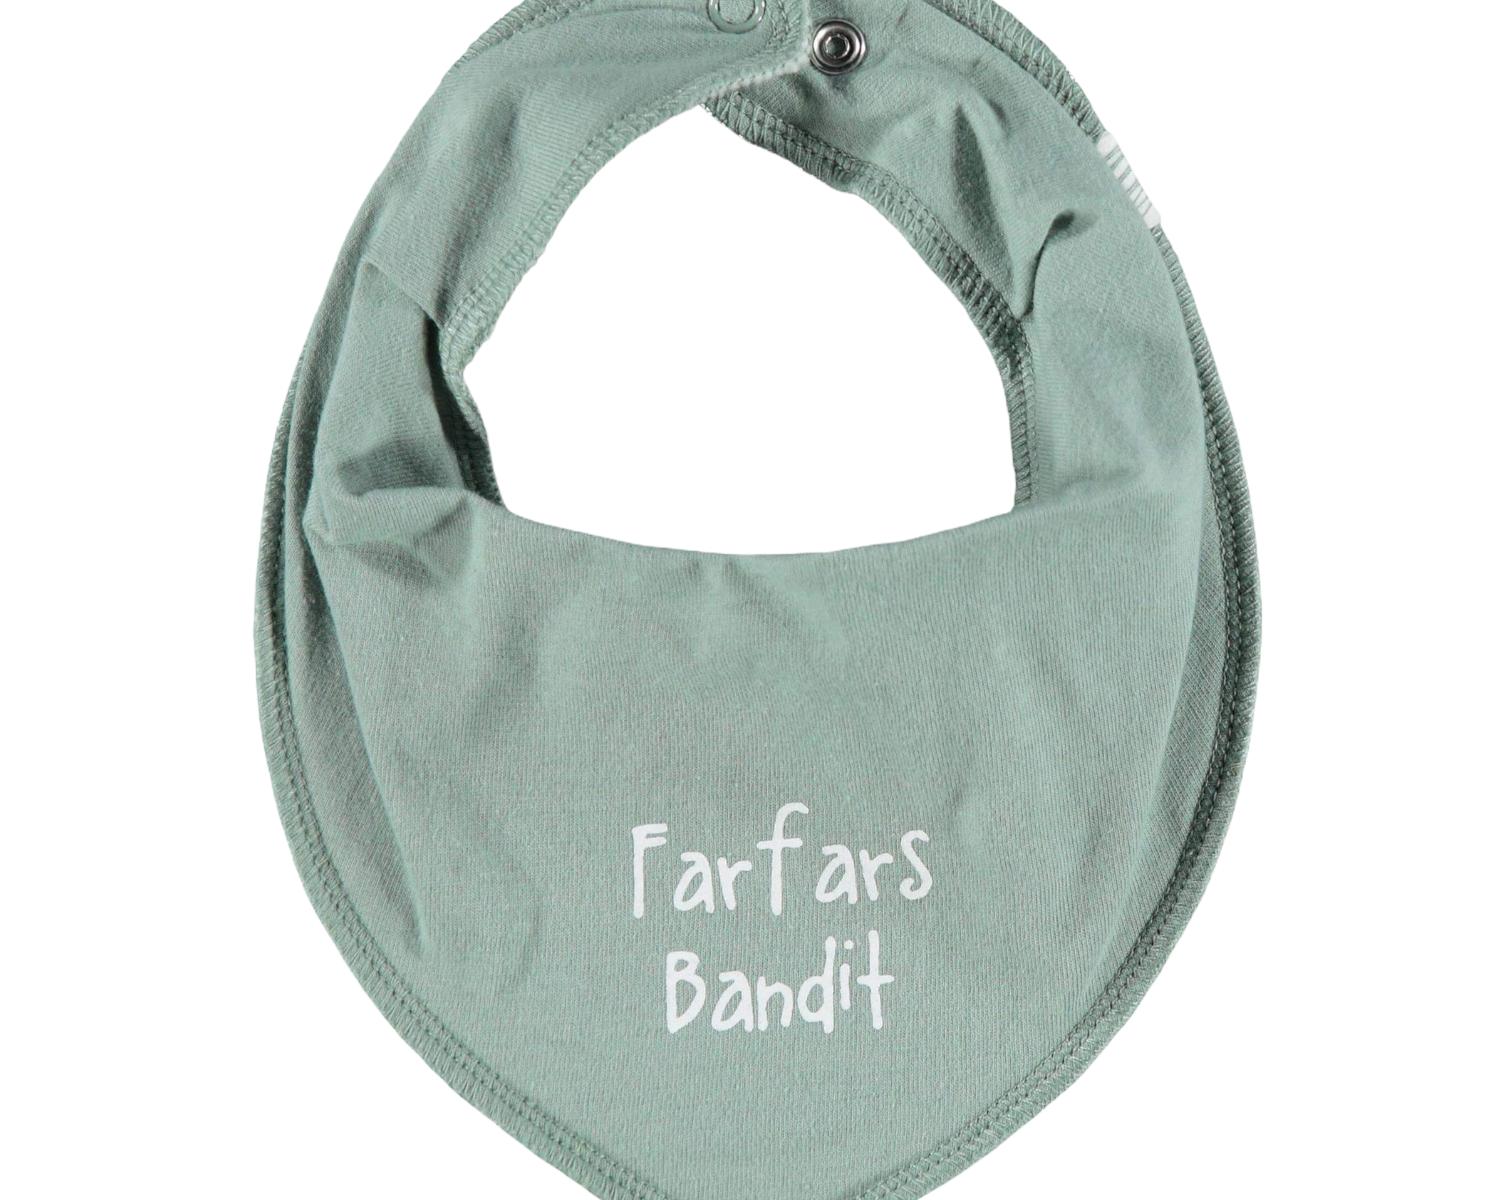 NAME IT FONNI SCARF FARFARS BANDIT 13197364